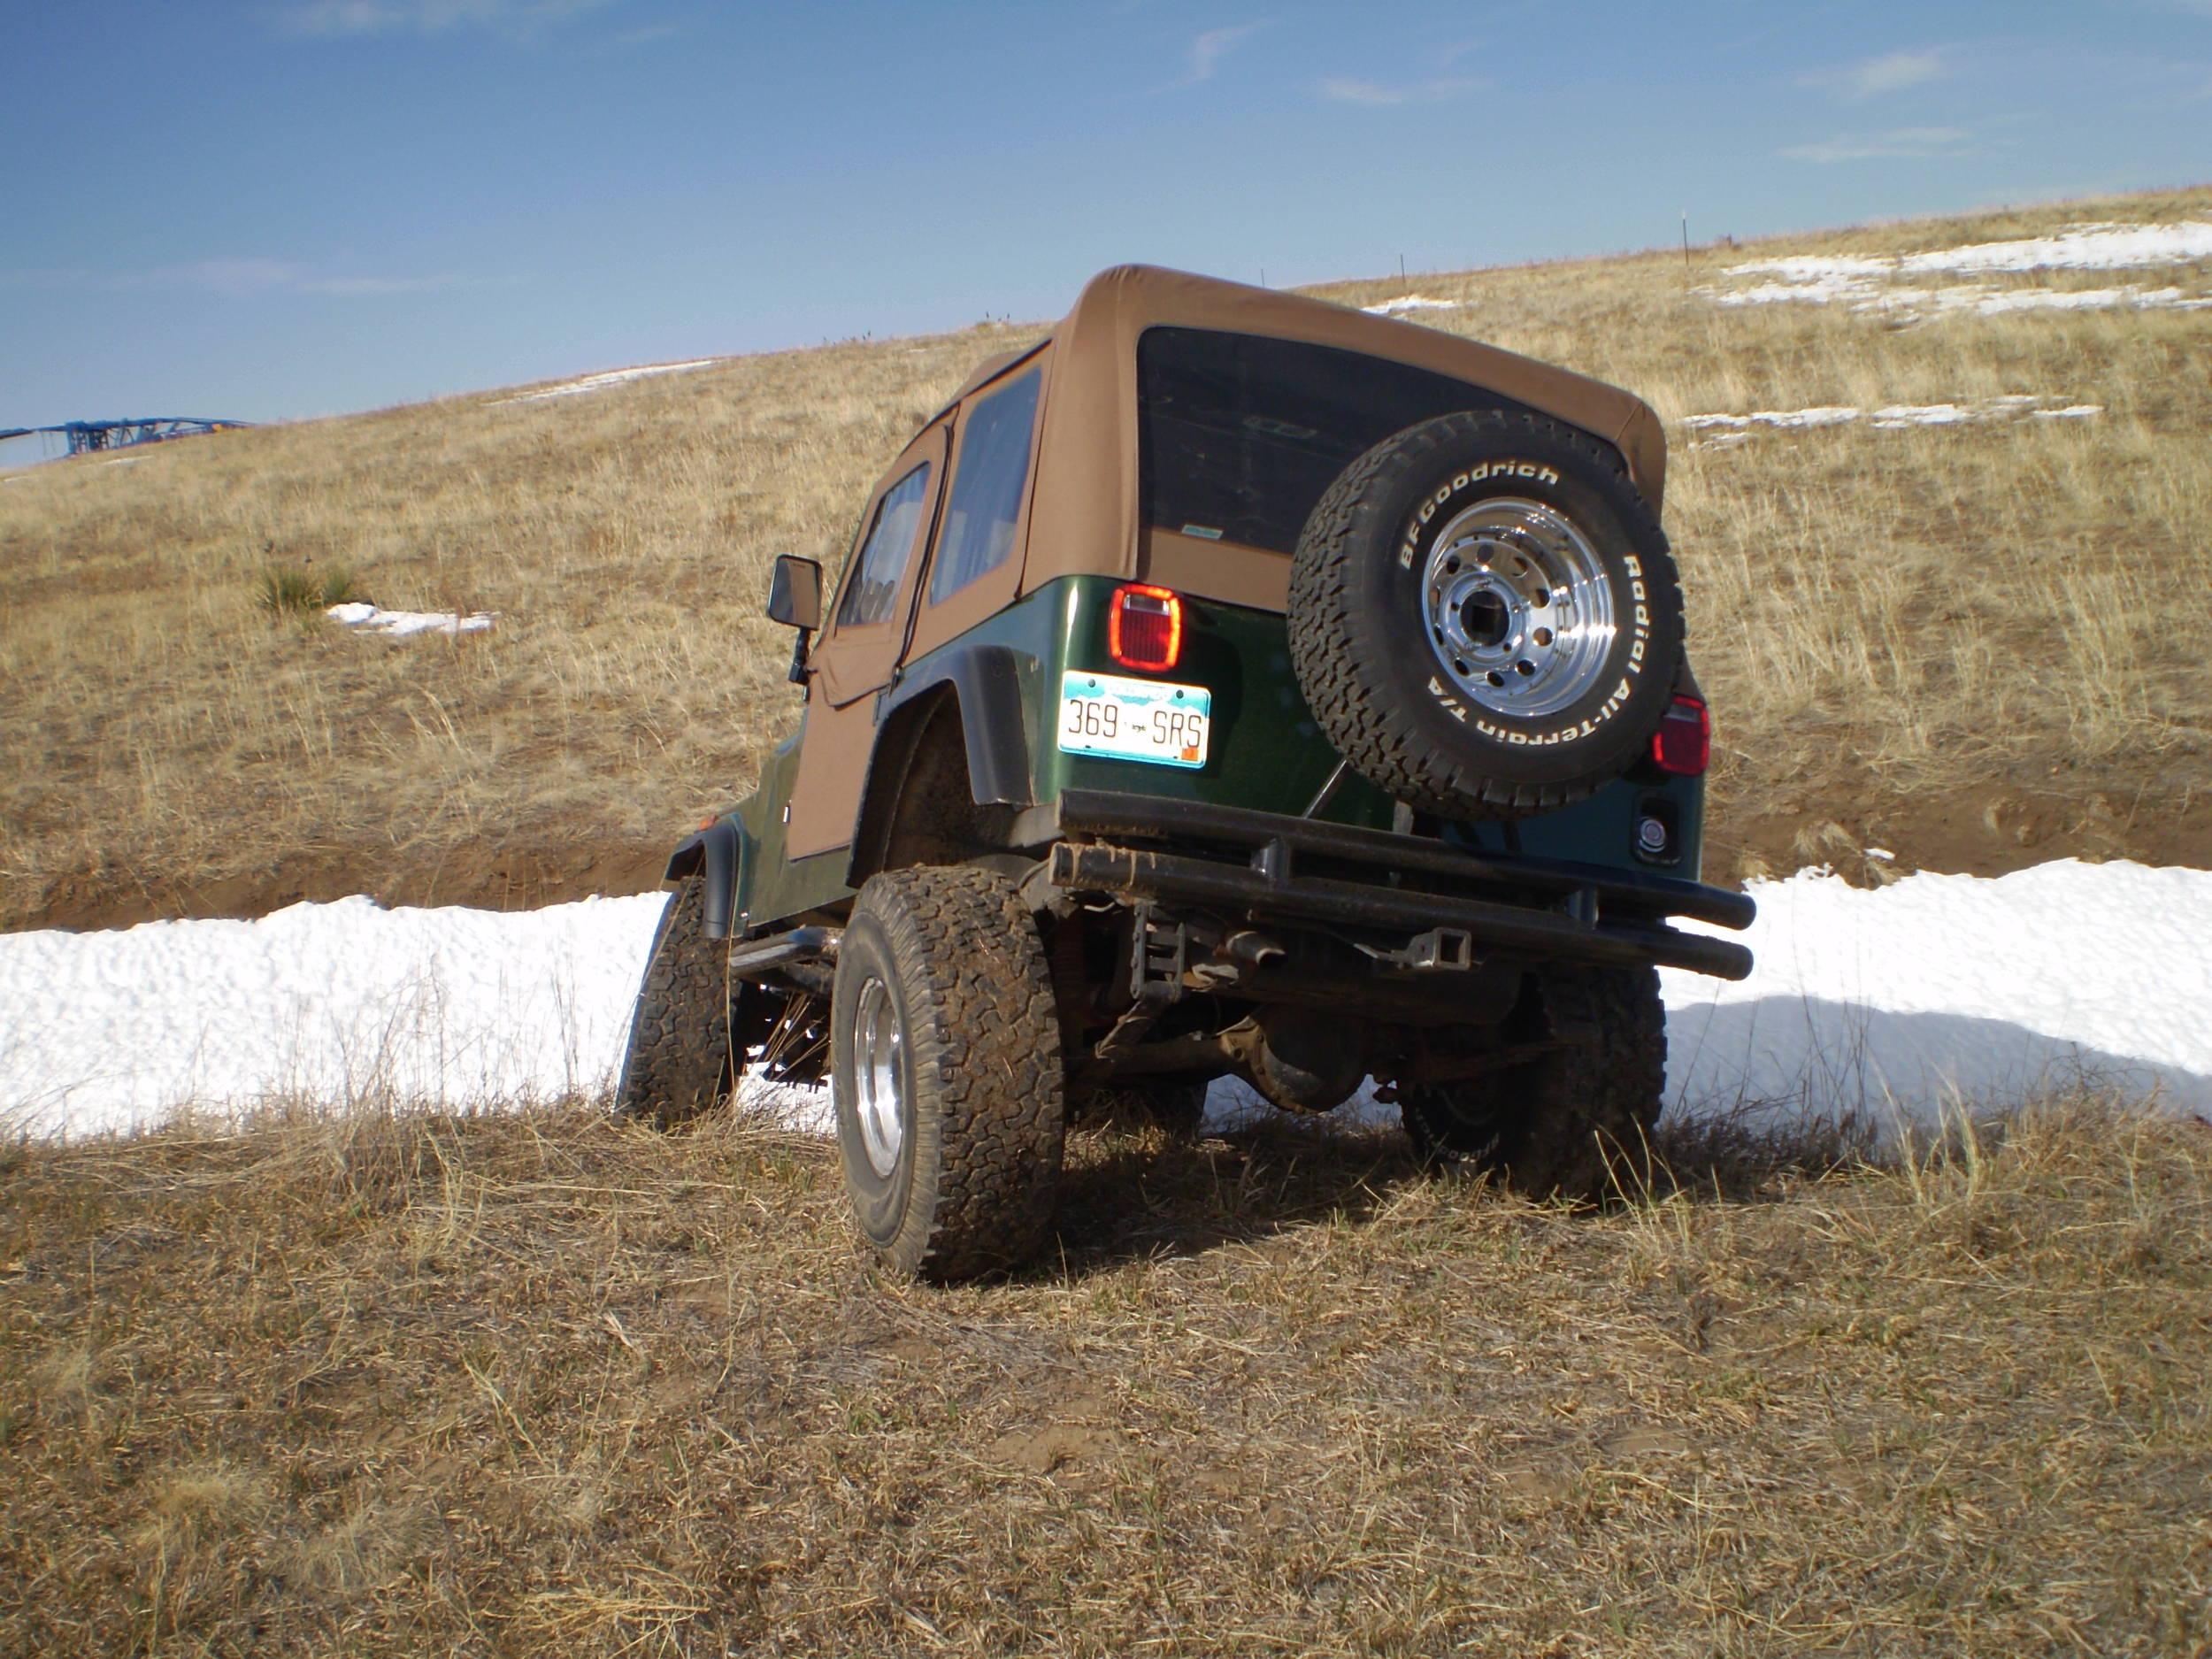 jeep1136.jpg